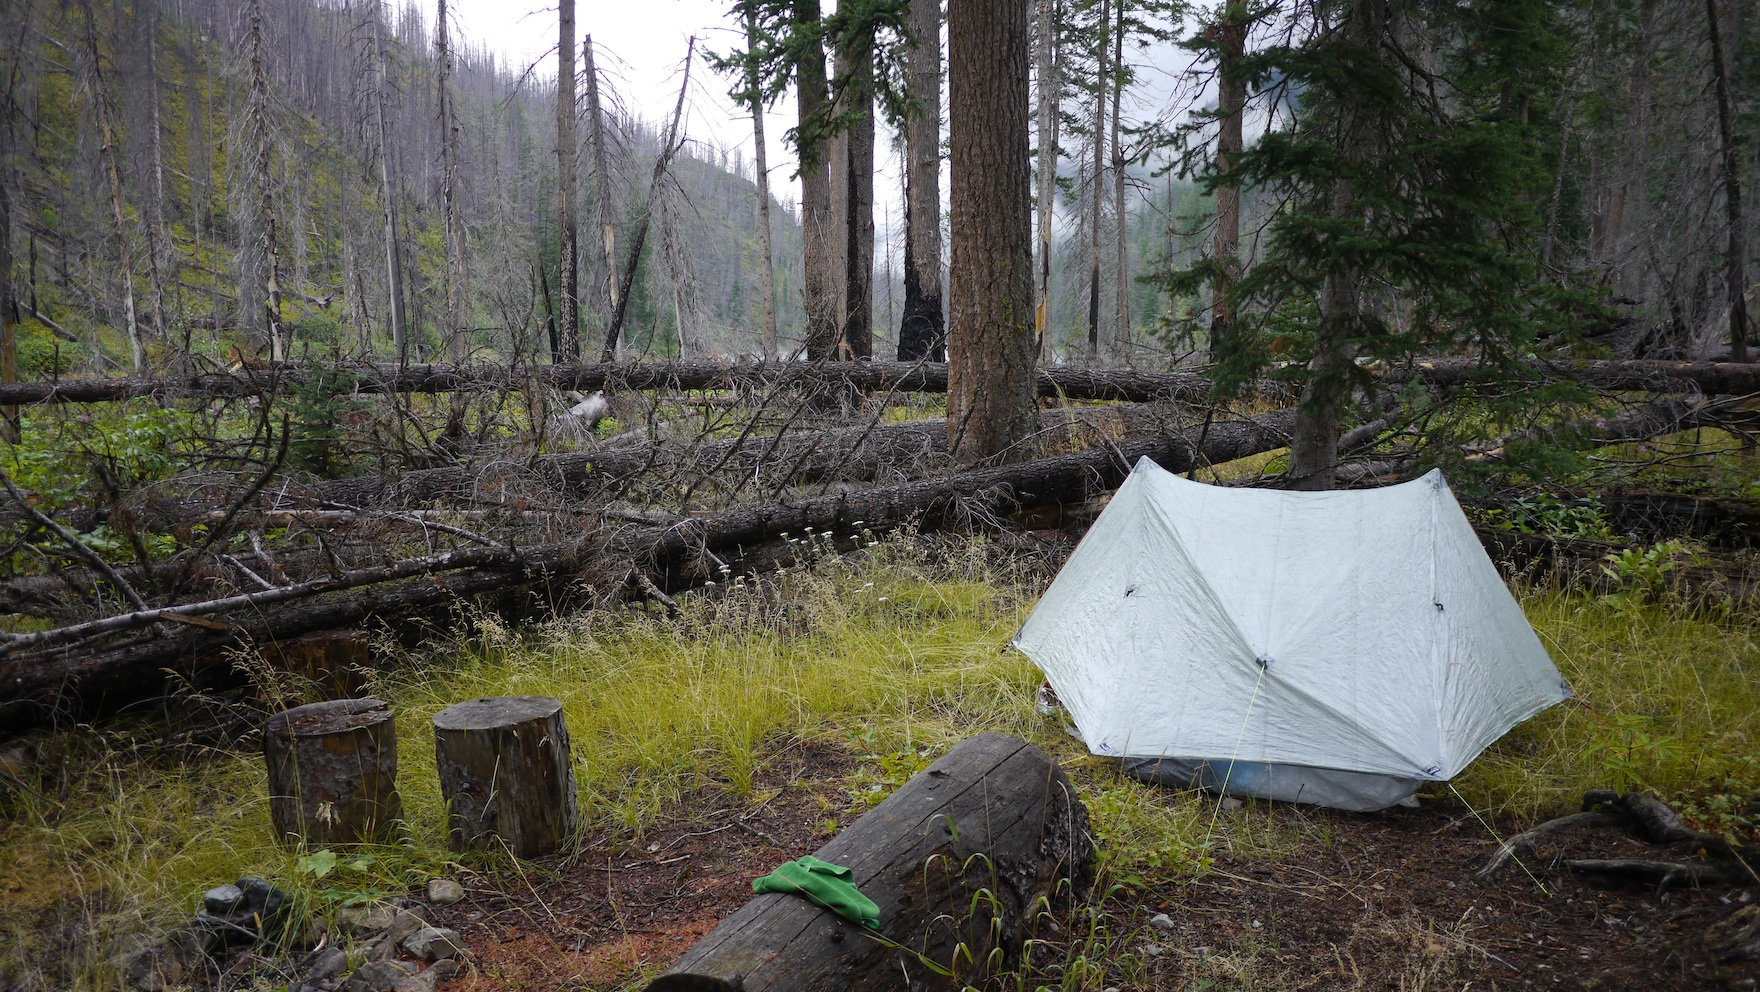 Middle Hidden Lake: campsite found in the dark